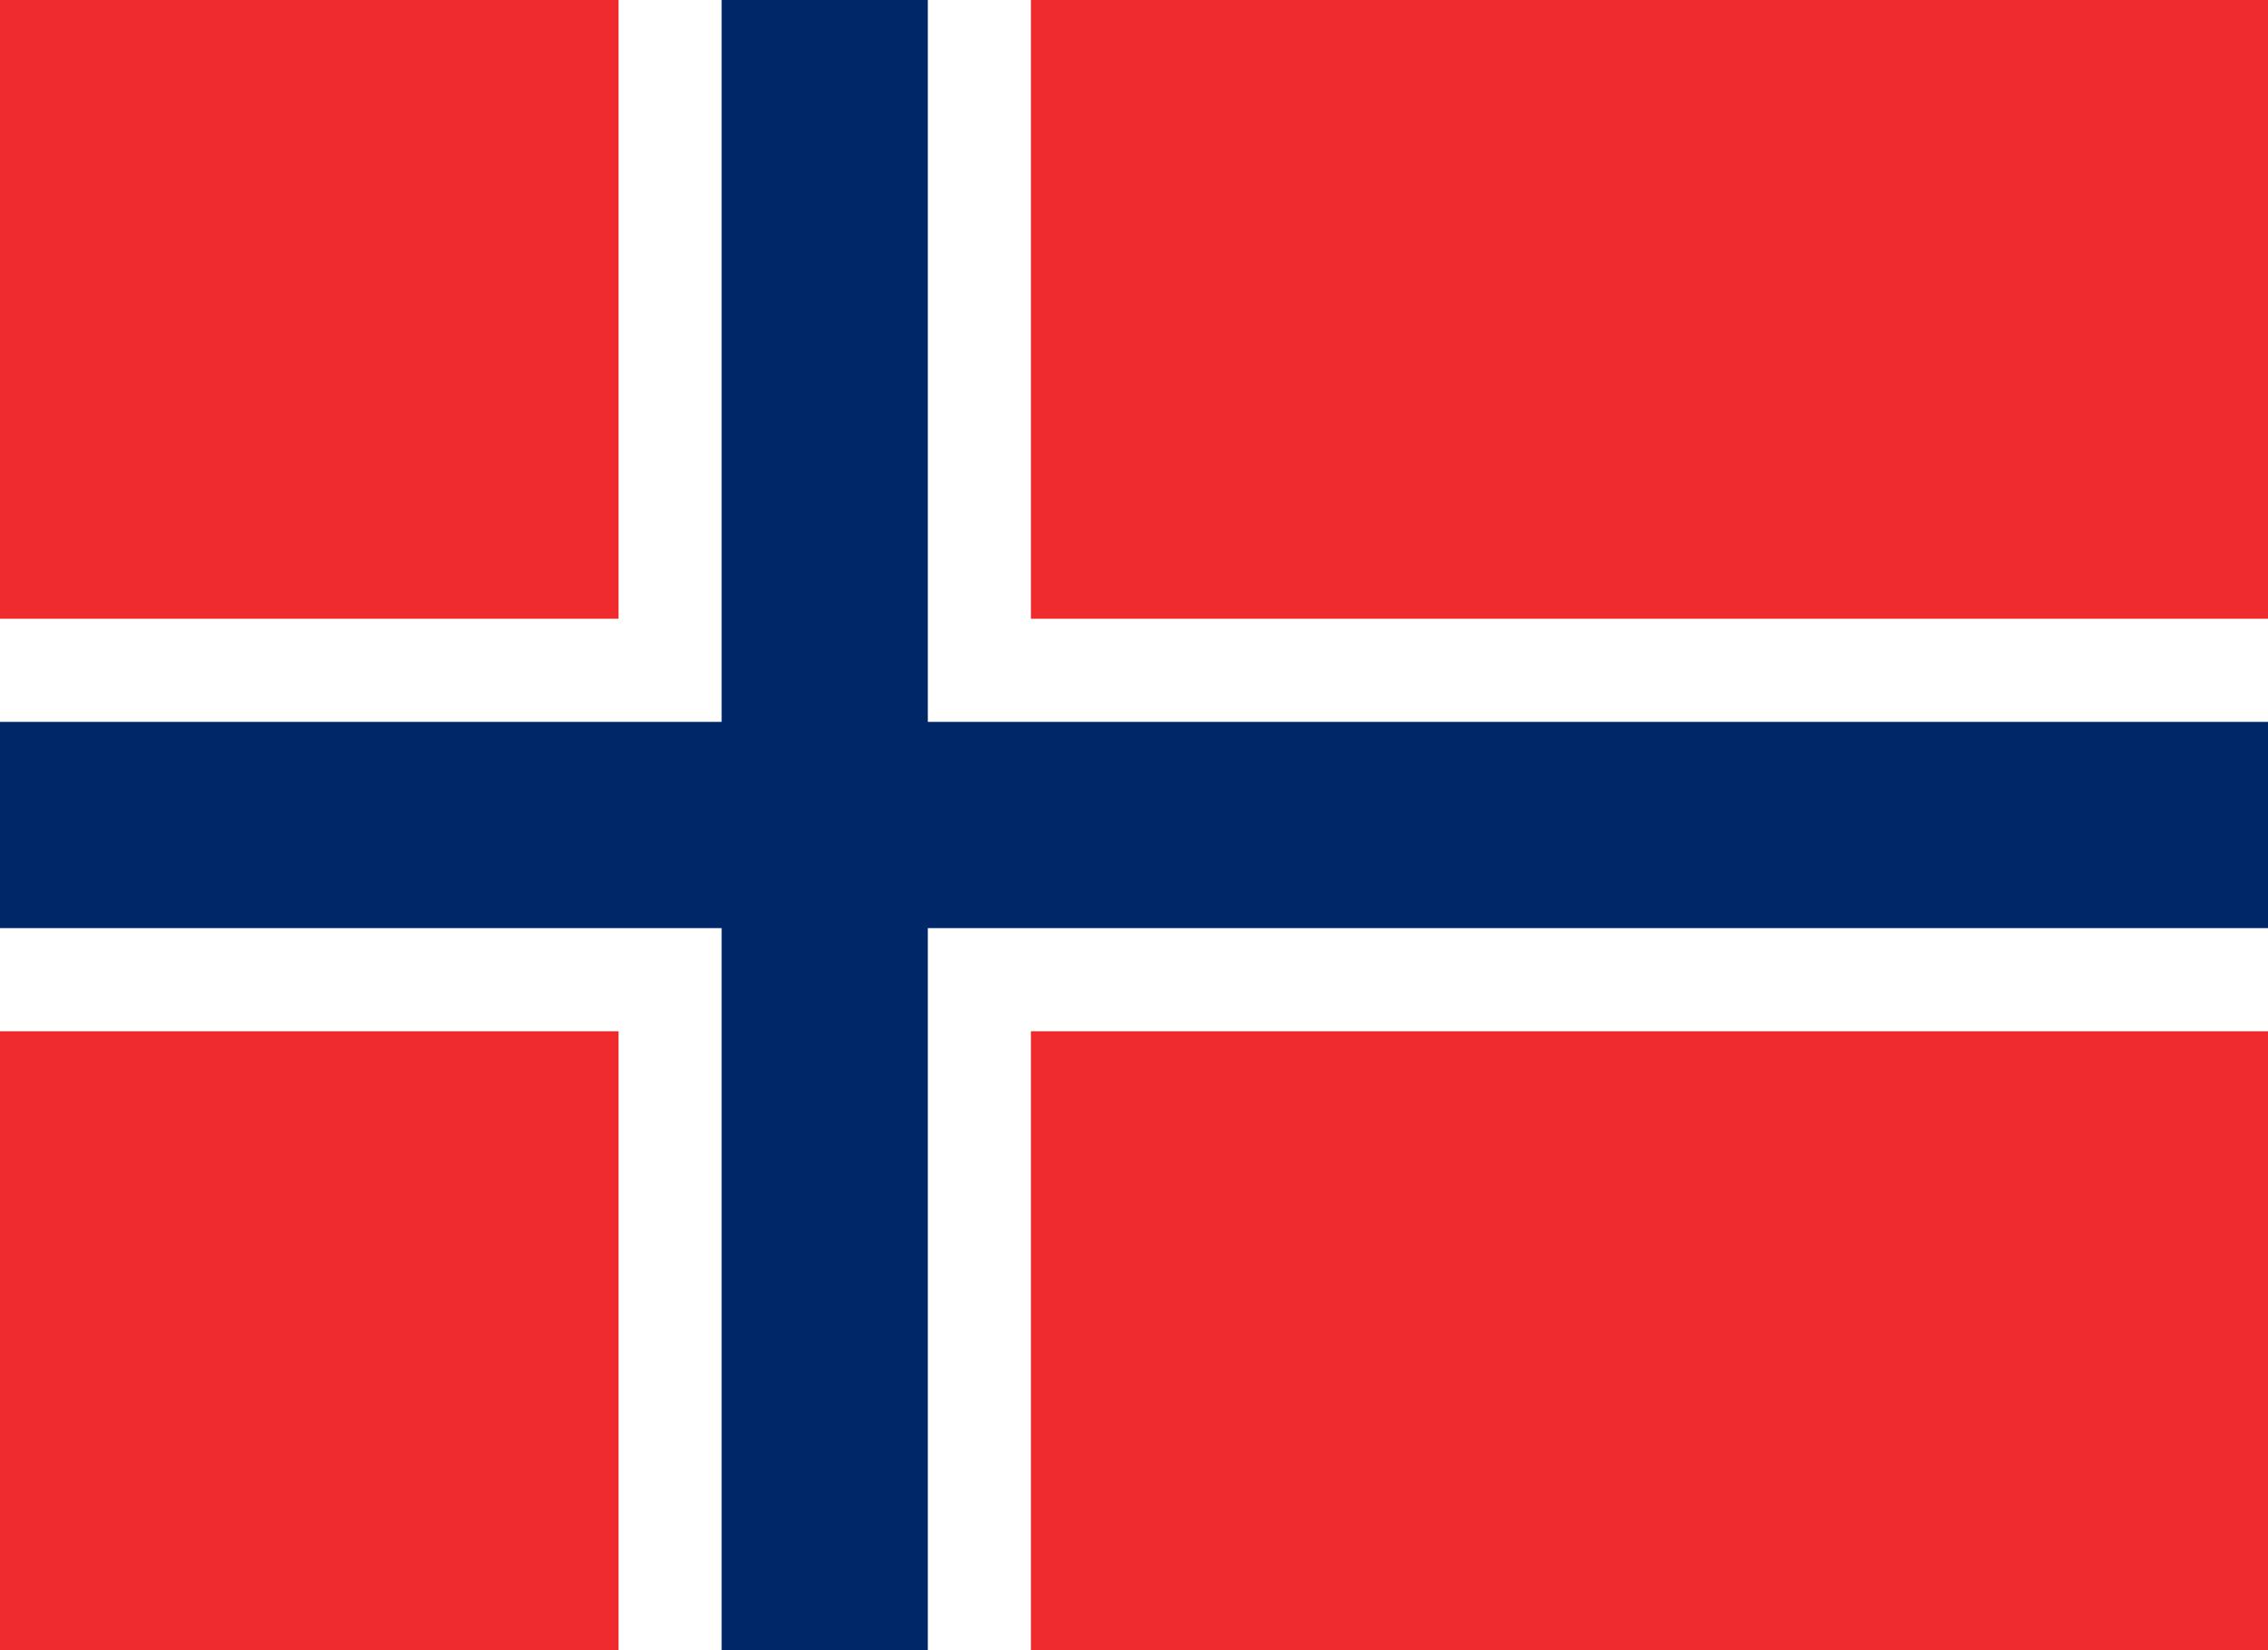 noruega, 国家, 会徽, 徽标, 符号 - 高清壁纸 - 教授-falken.com